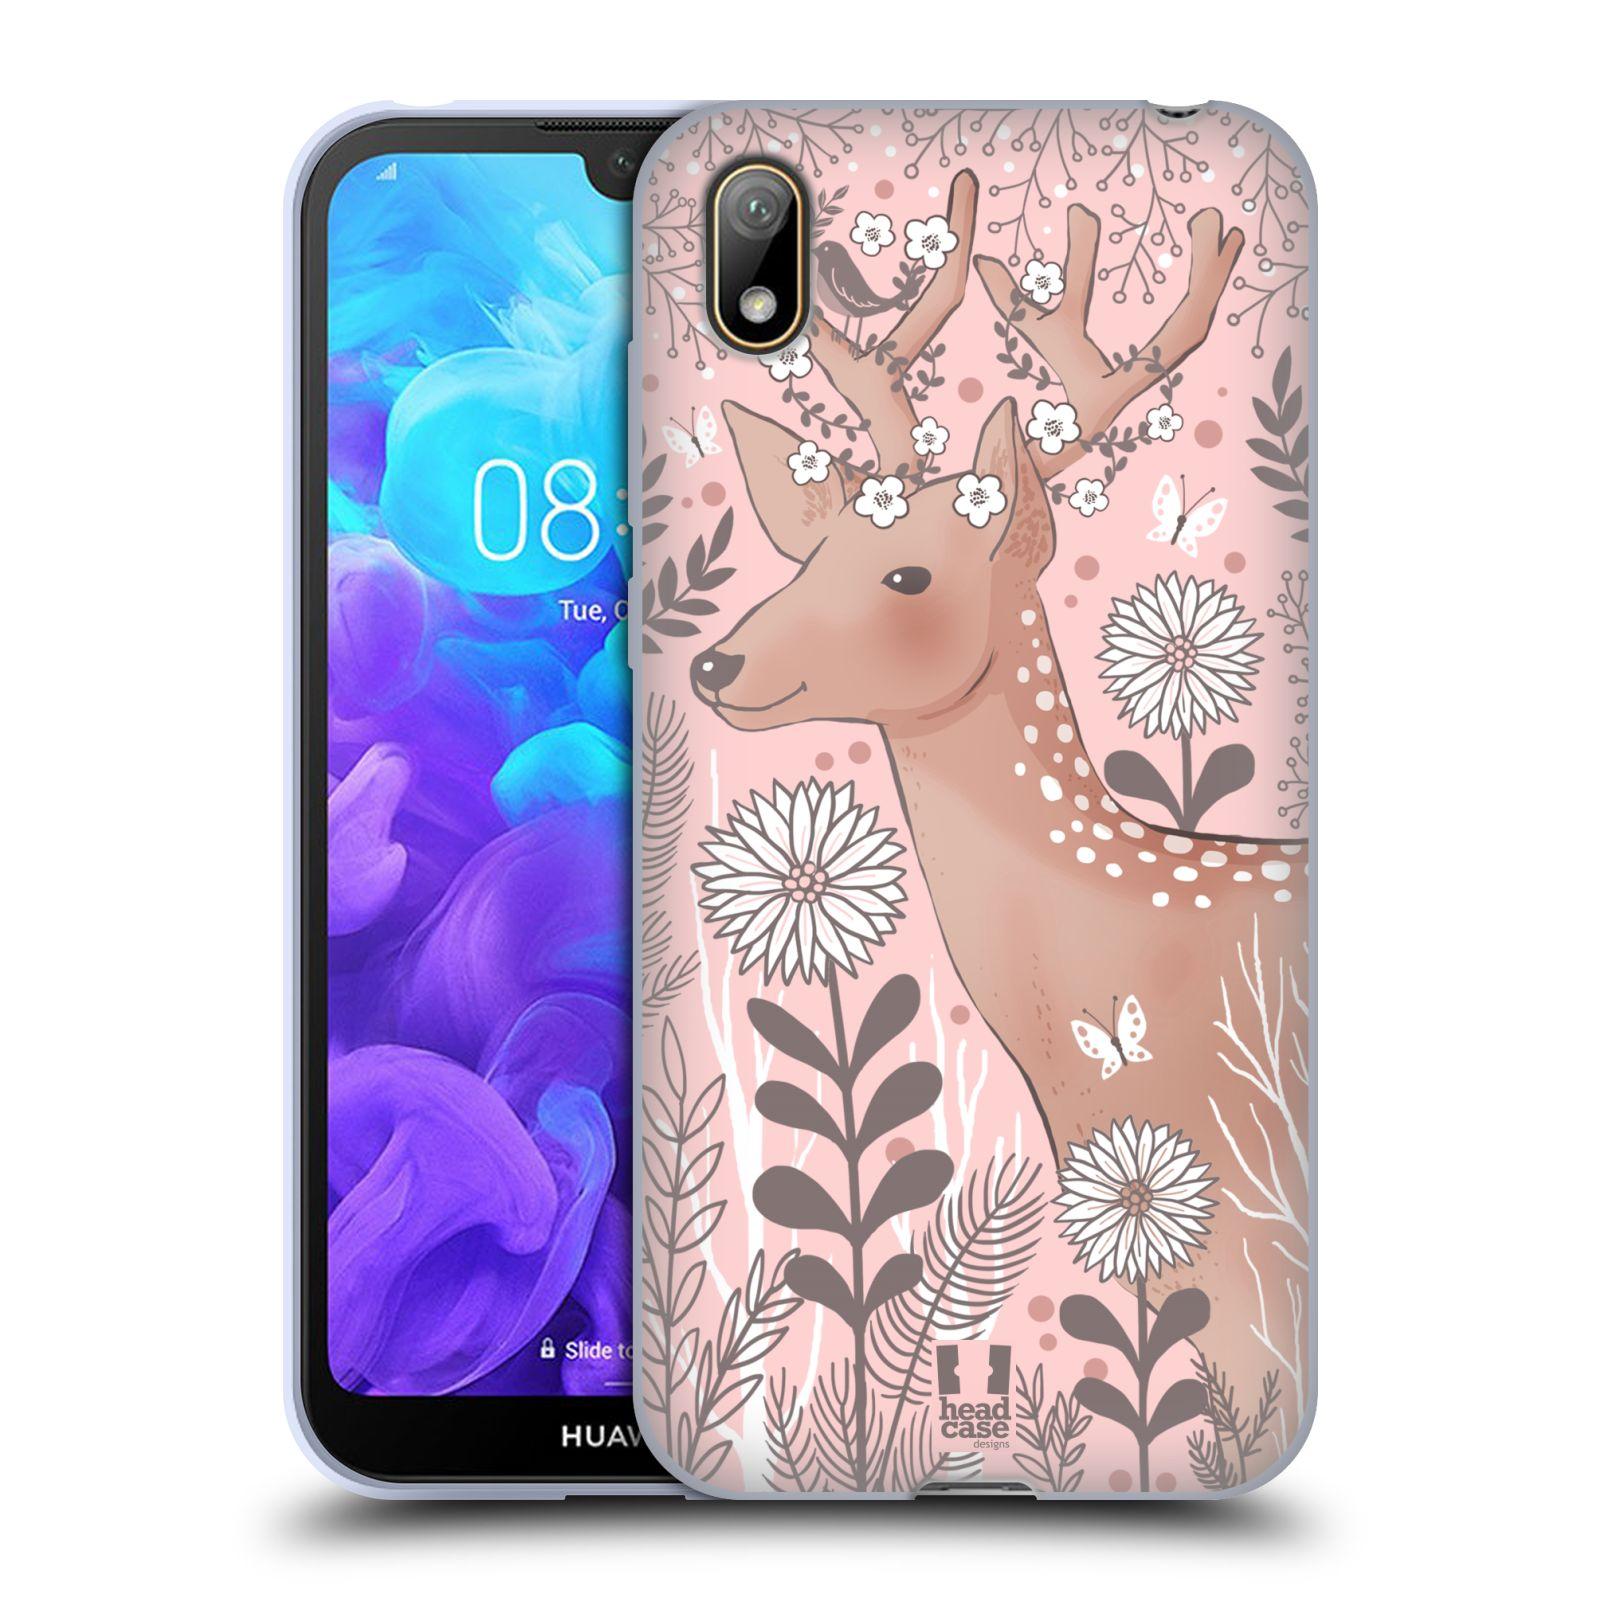 Silikonové pouzdro na mobil Huawei Y5 (2019) - Head Case - Jelíneček